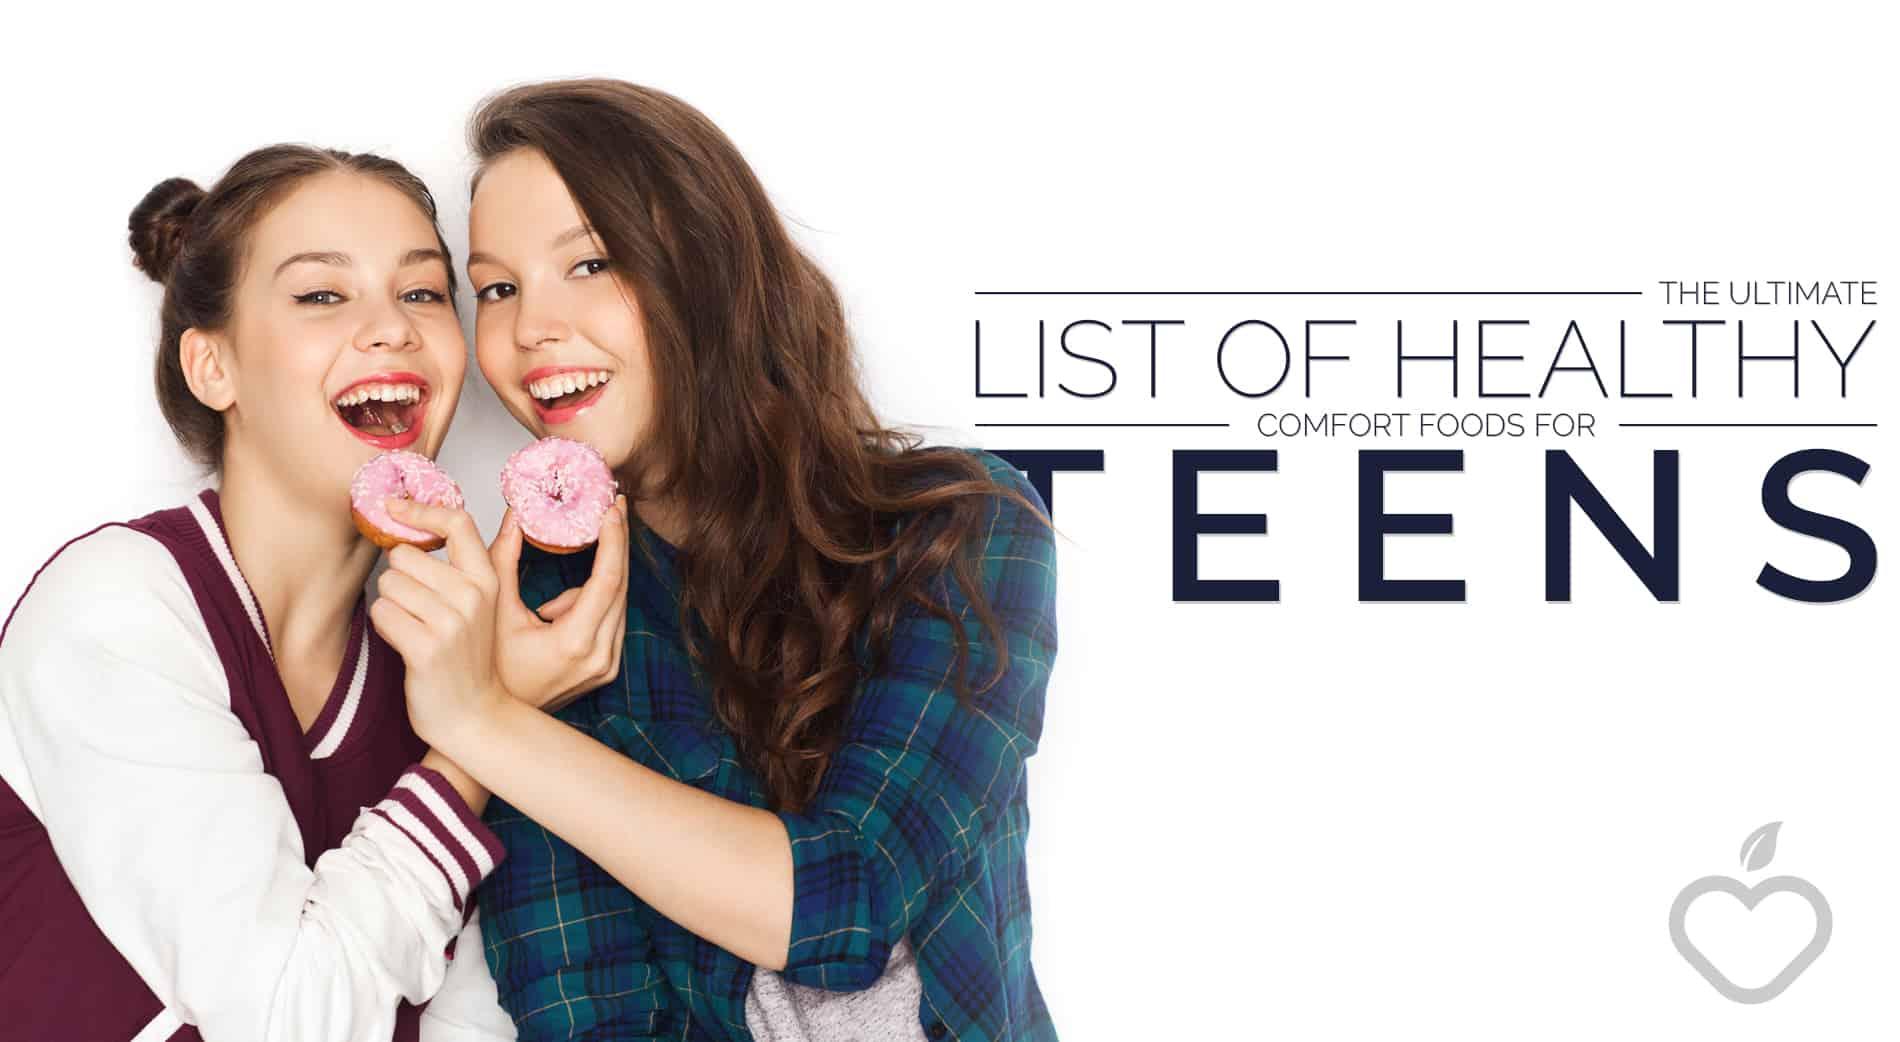 Teens Image Design 1 - The Ultimate List Of Healthy Comfort Food For Teens